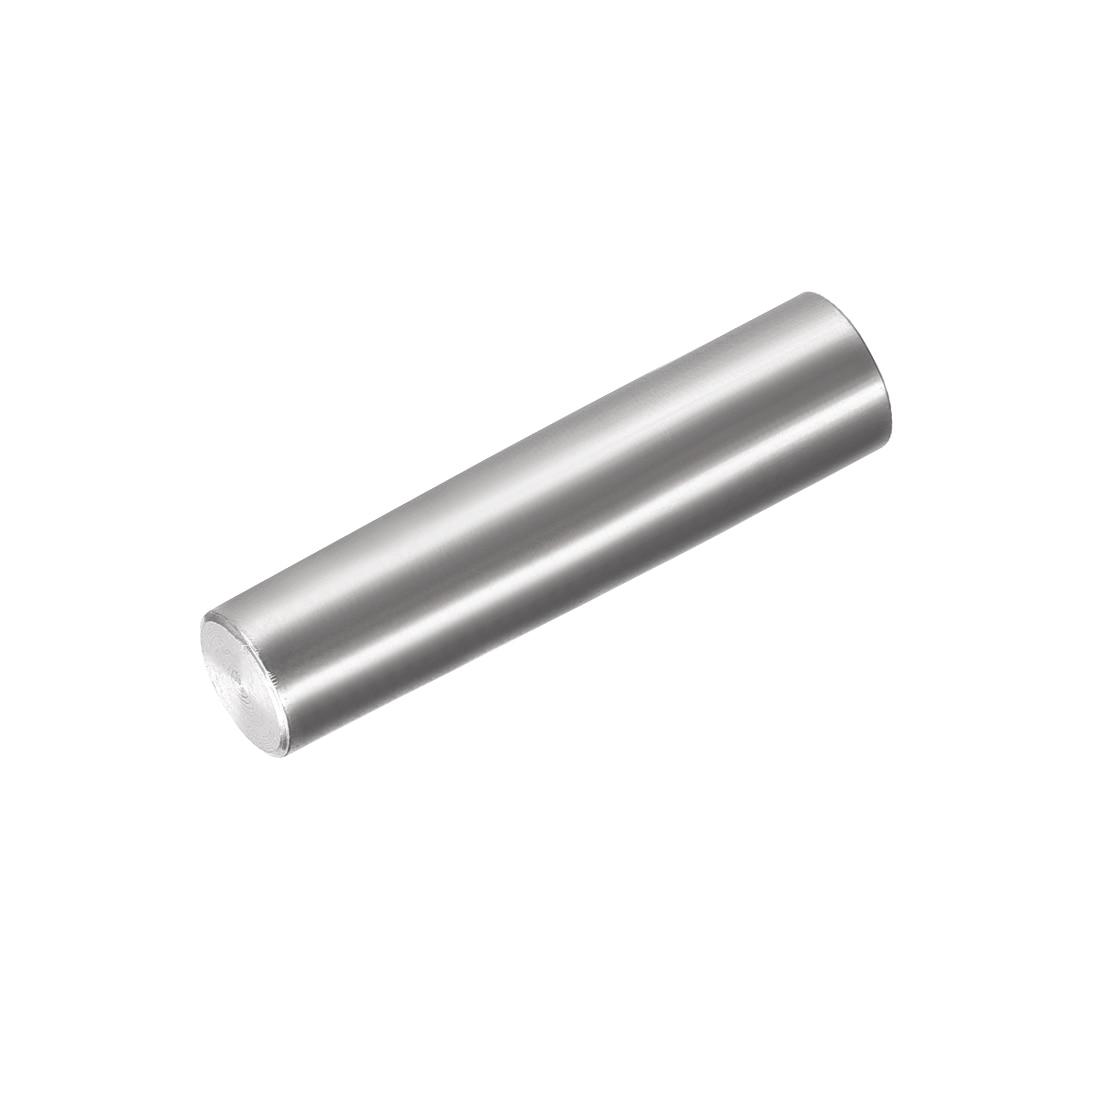 uxcell 1.7mm x 10mm Dowel Pin Carbon Steel Split Spring Roll Shelf Support Pin Fasten Hardware Black 50 Pcs